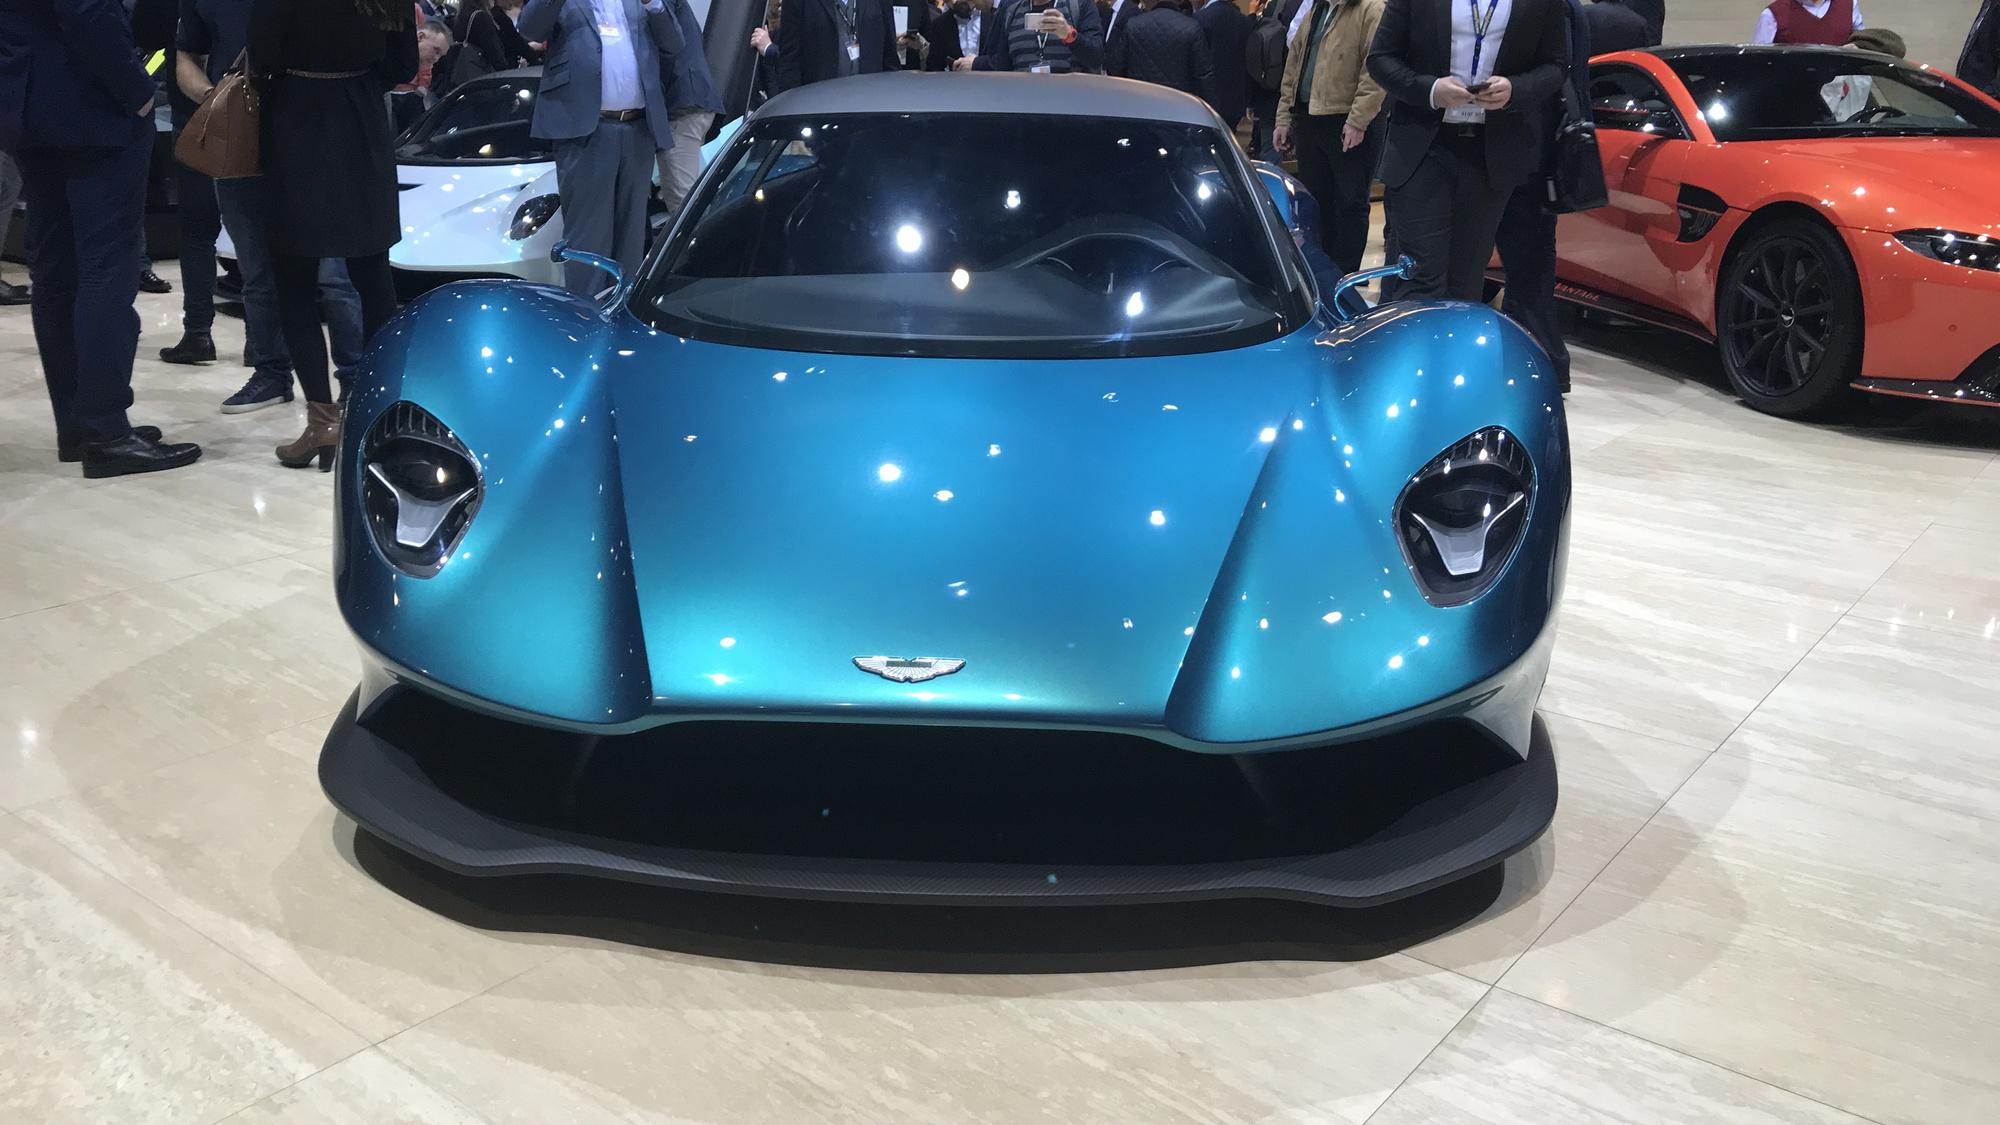 Aston Martin Vanquish Vision concept, courtesy Jill Ciminillo